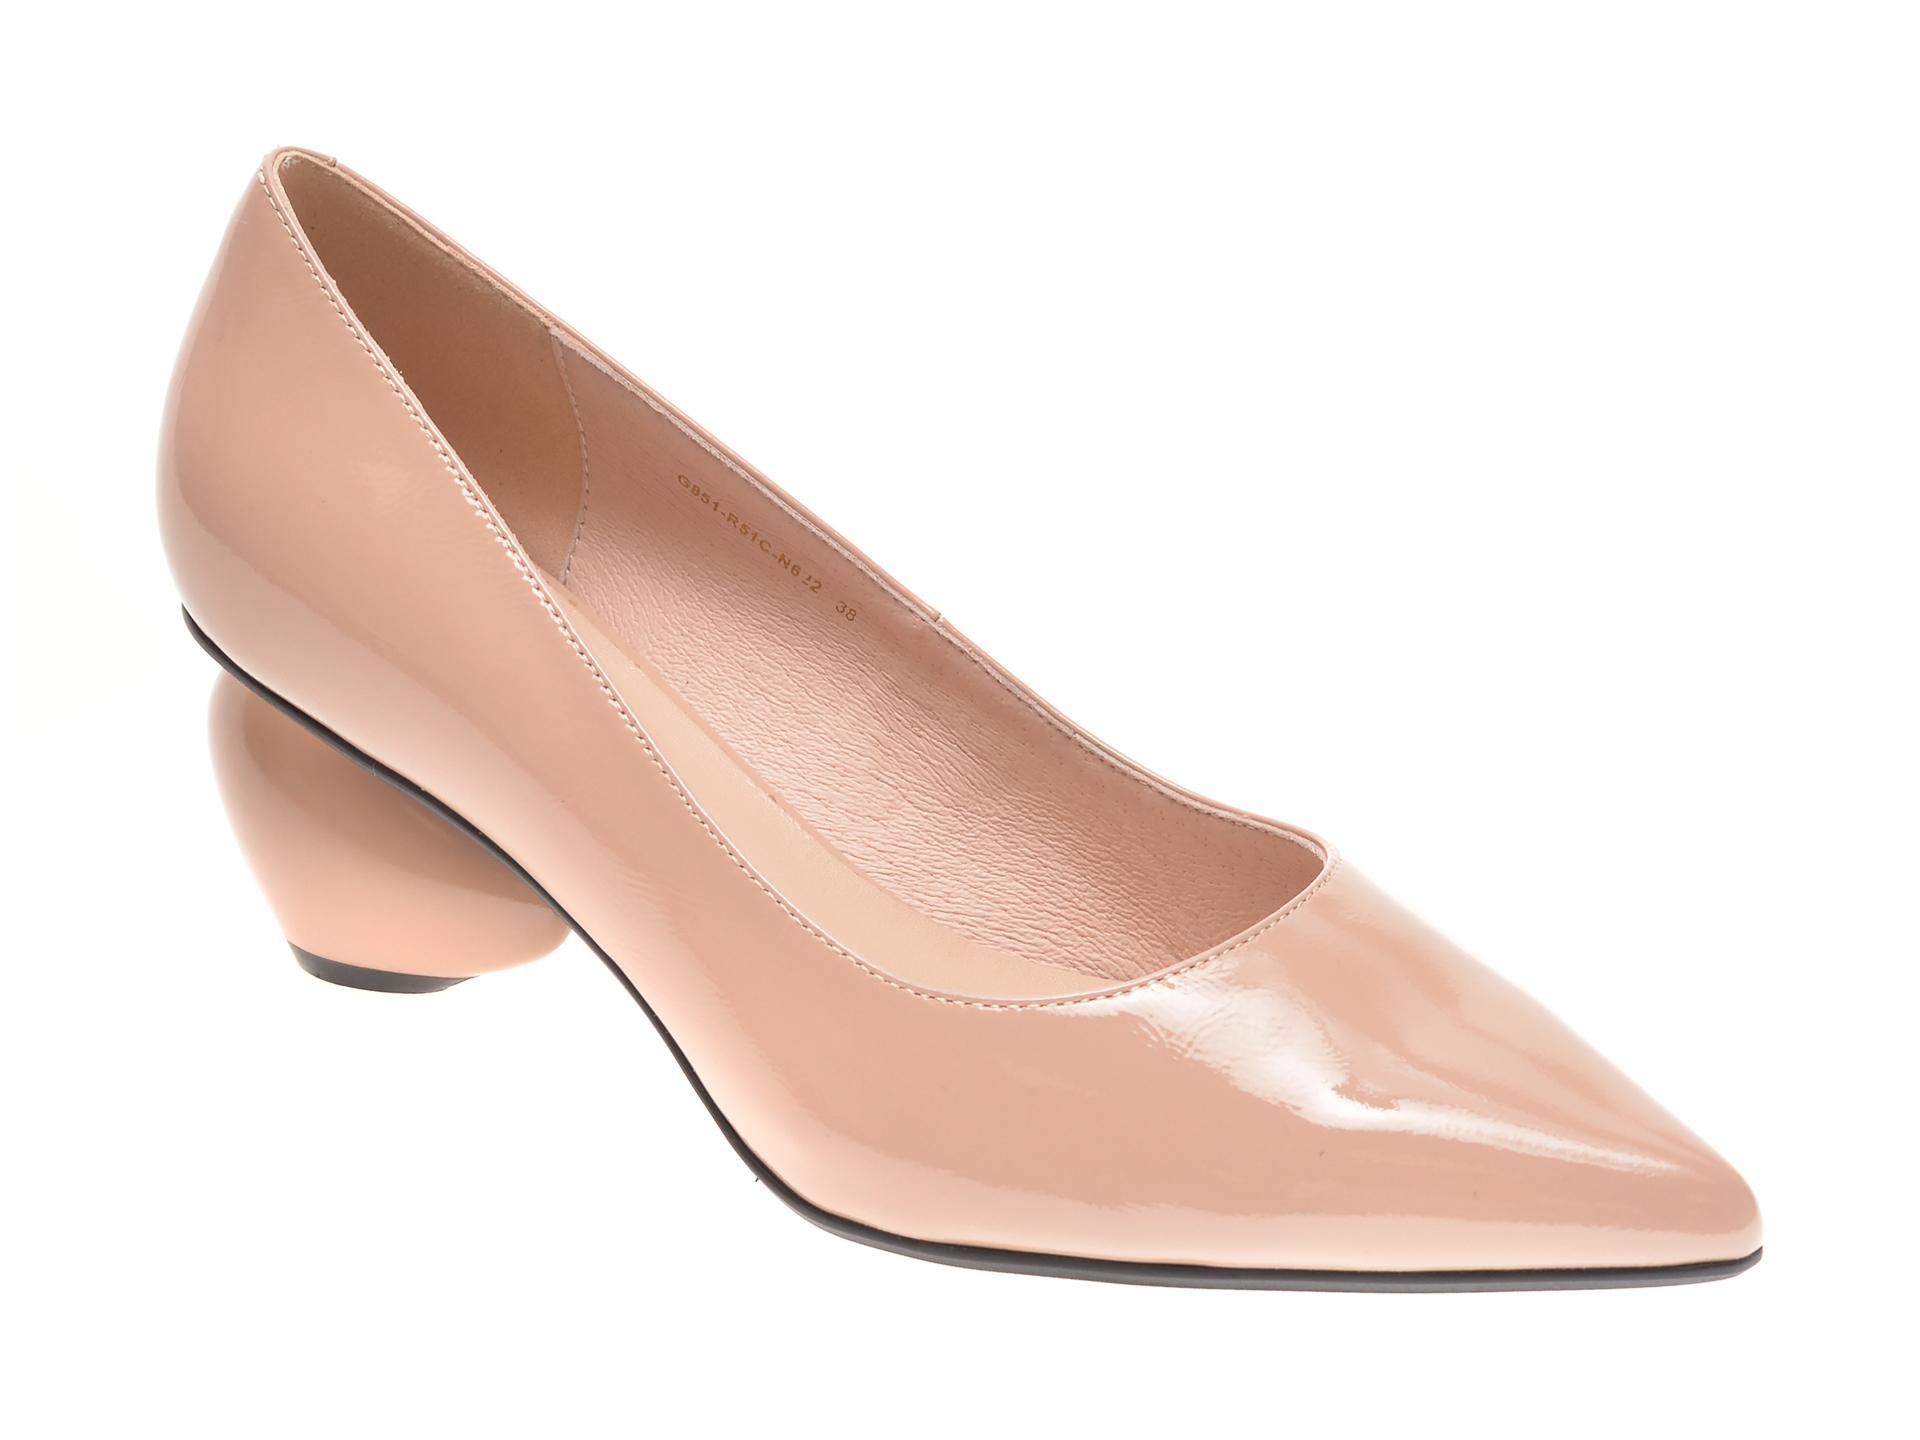 Pantofi EPICA bej, G851R51, din piele naturala lacuita imagine otter.ro